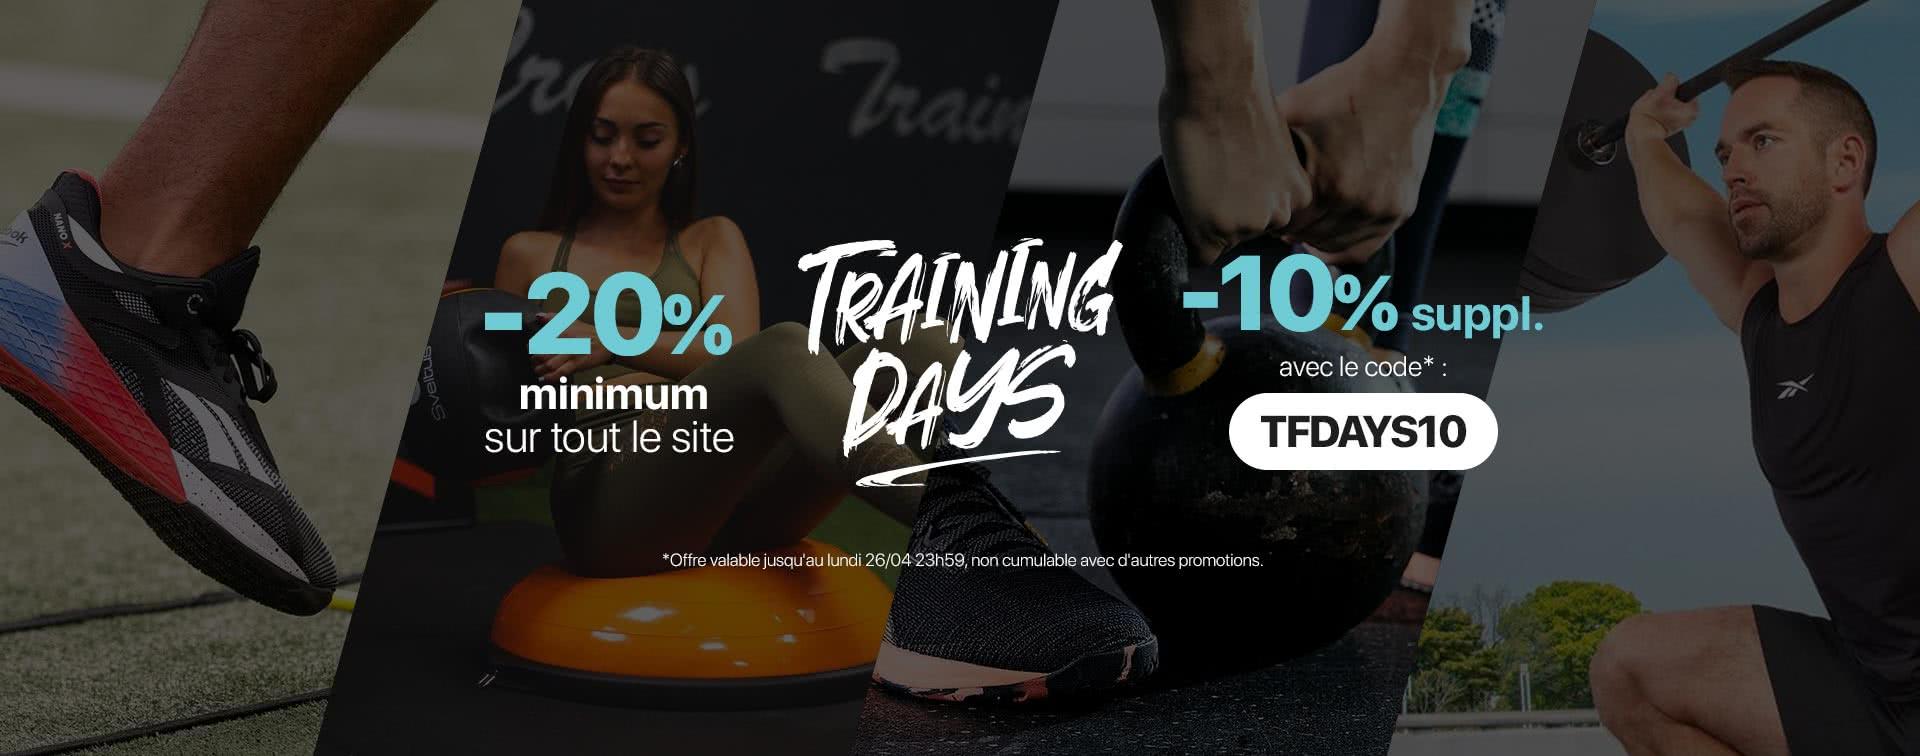 Training Days